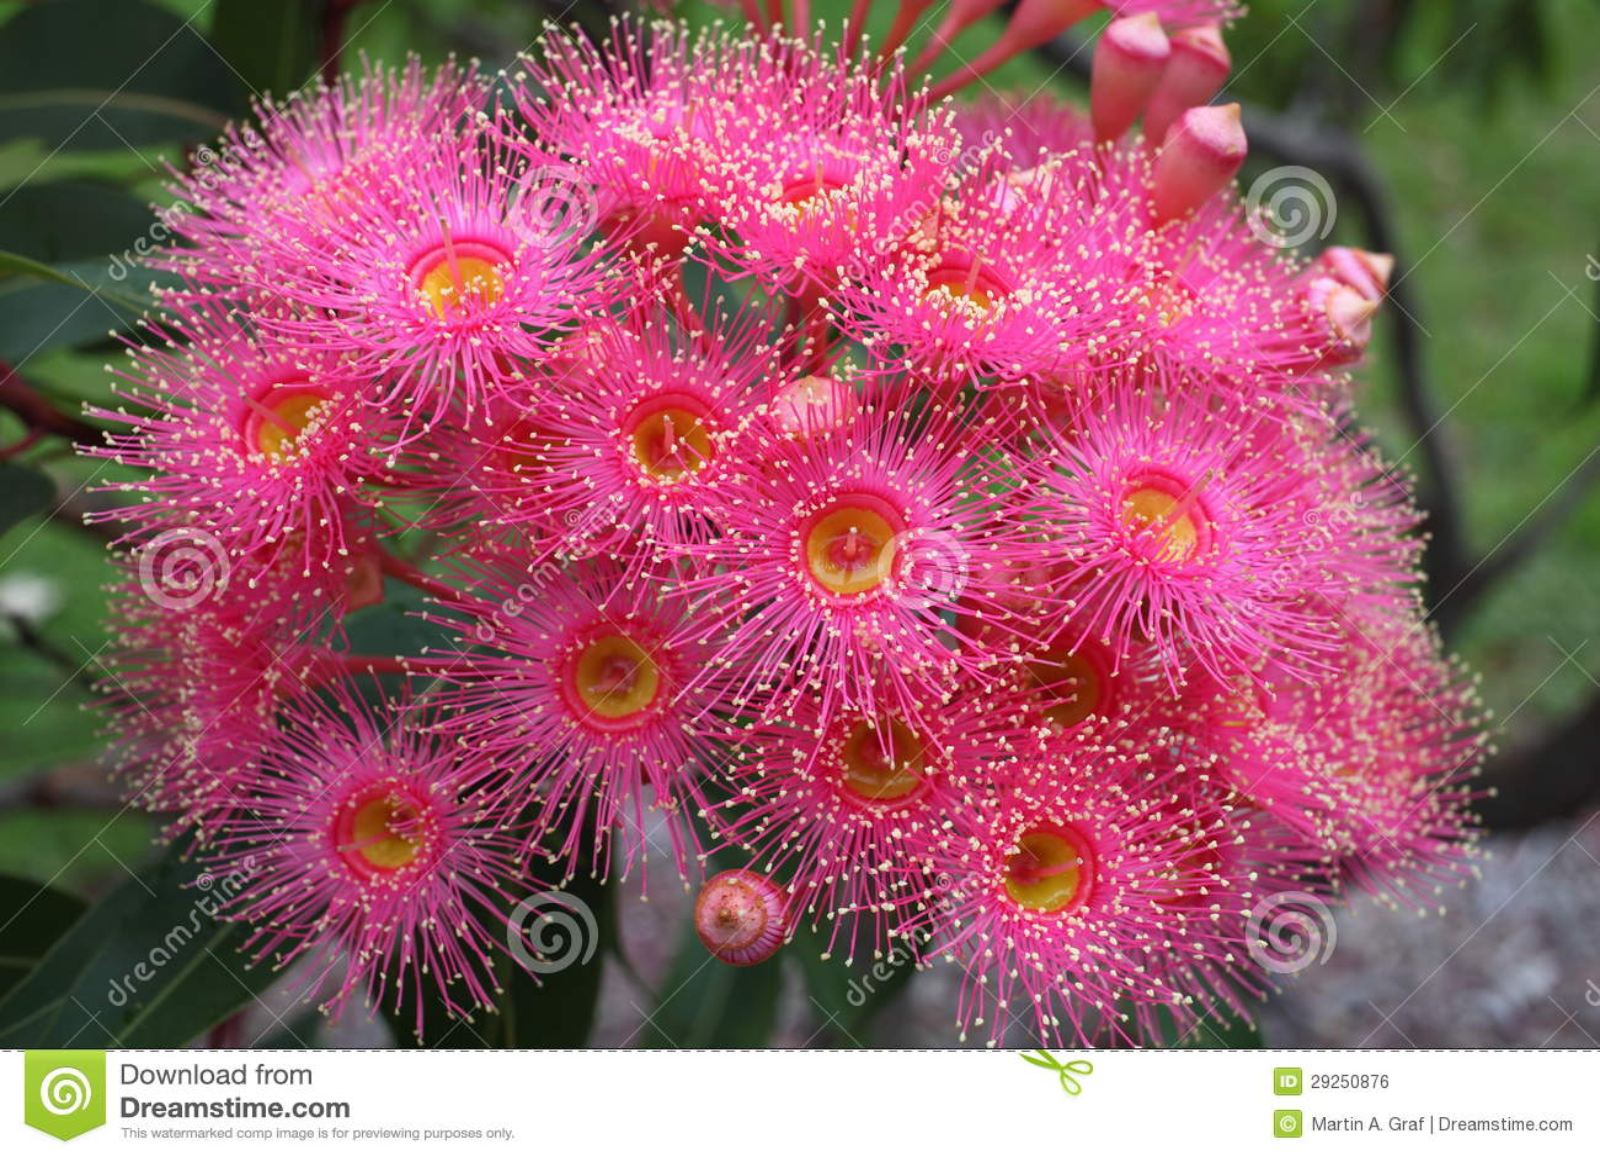 Eucalyptus flower pink bloom stock photo image of bouquet eucalyptus flower pink bloom mightylinksfo